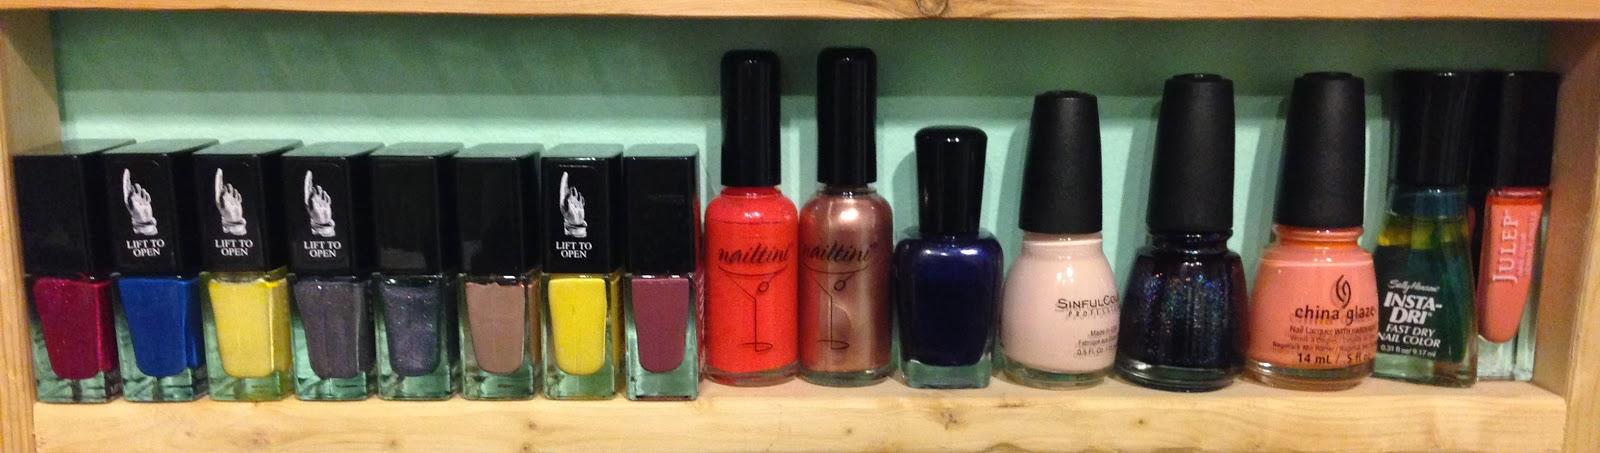 lovelifeoutloud: Nail Polish Collection Part 1